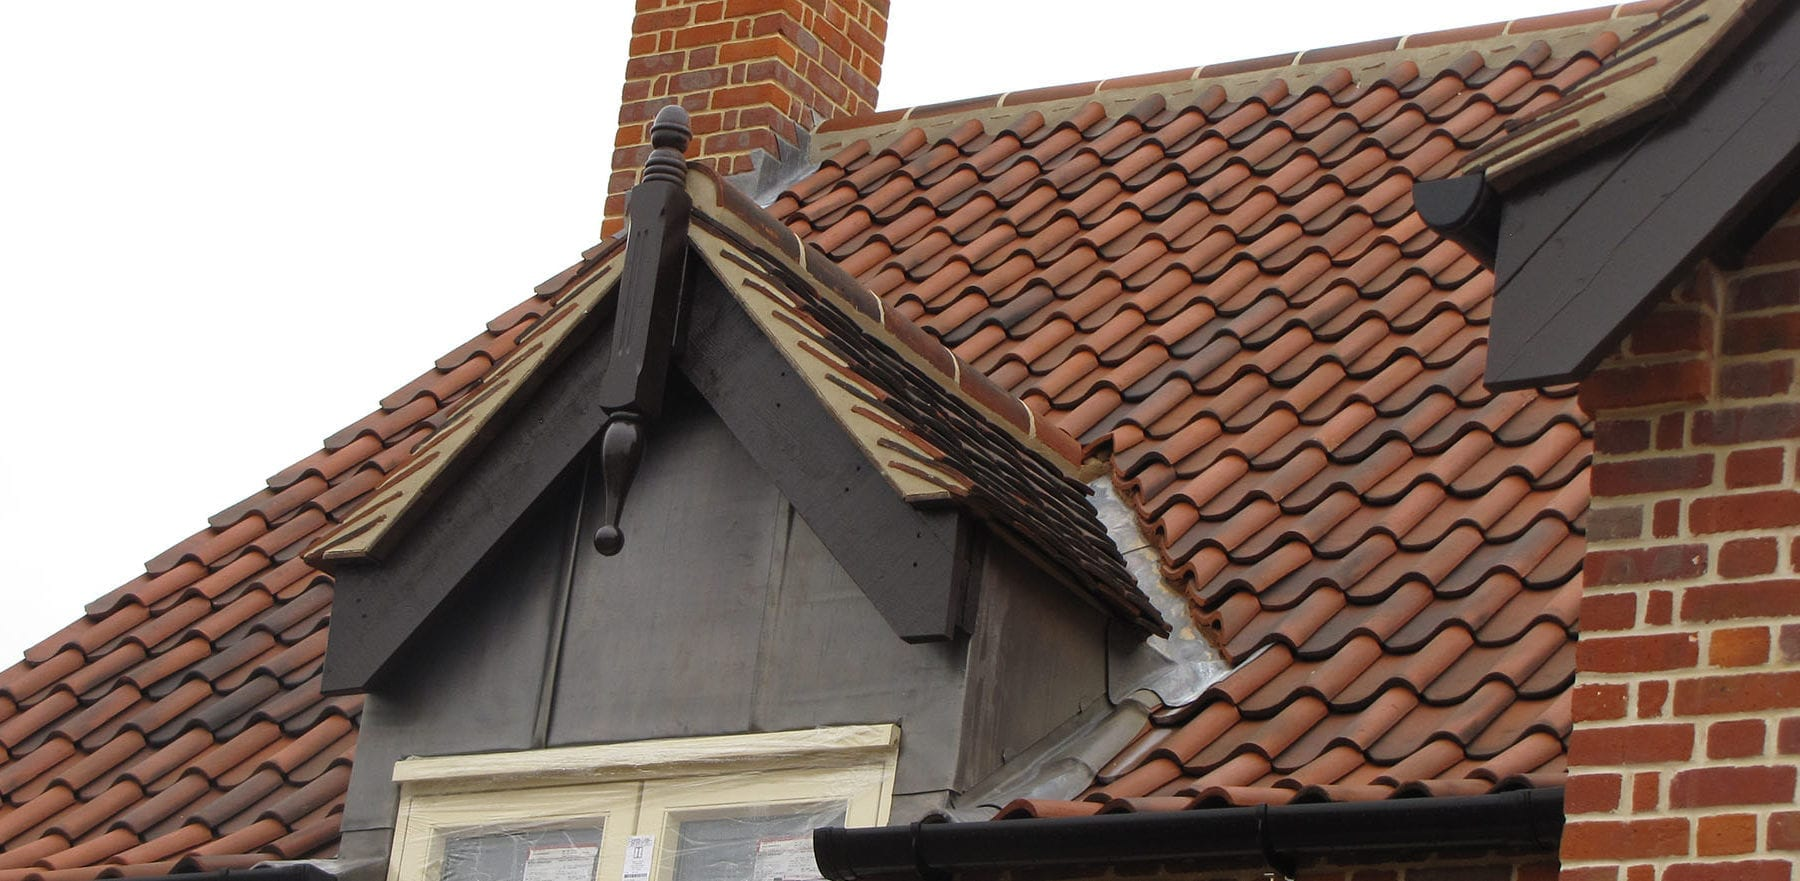 Lifestiles - Restoration Pantiles - Norfolk, England 3